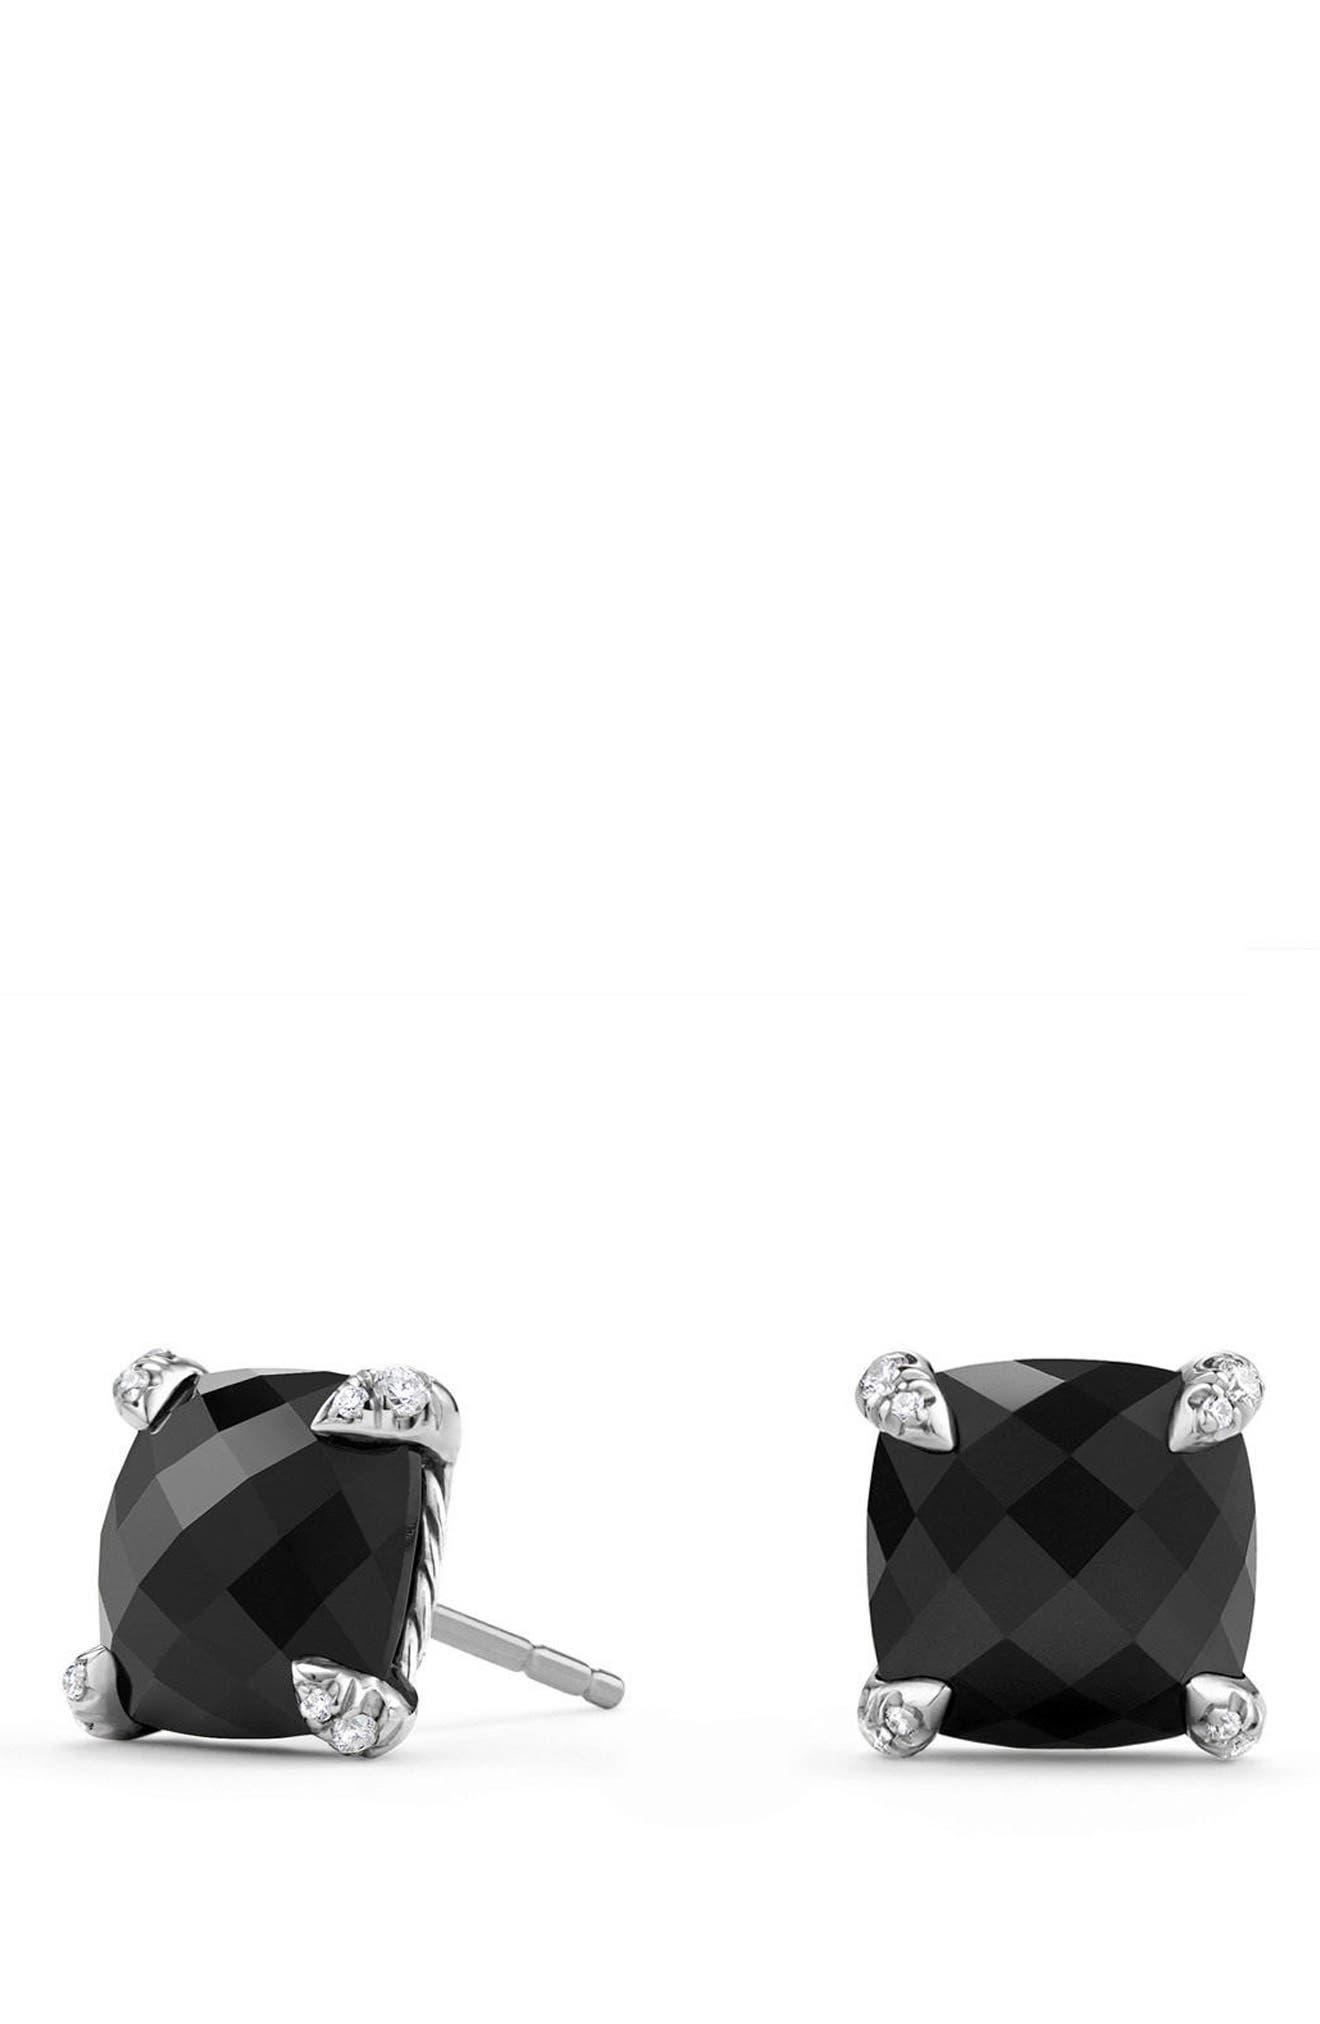 Main Image - David Yurman Châtelaine Earrings with Diamonds